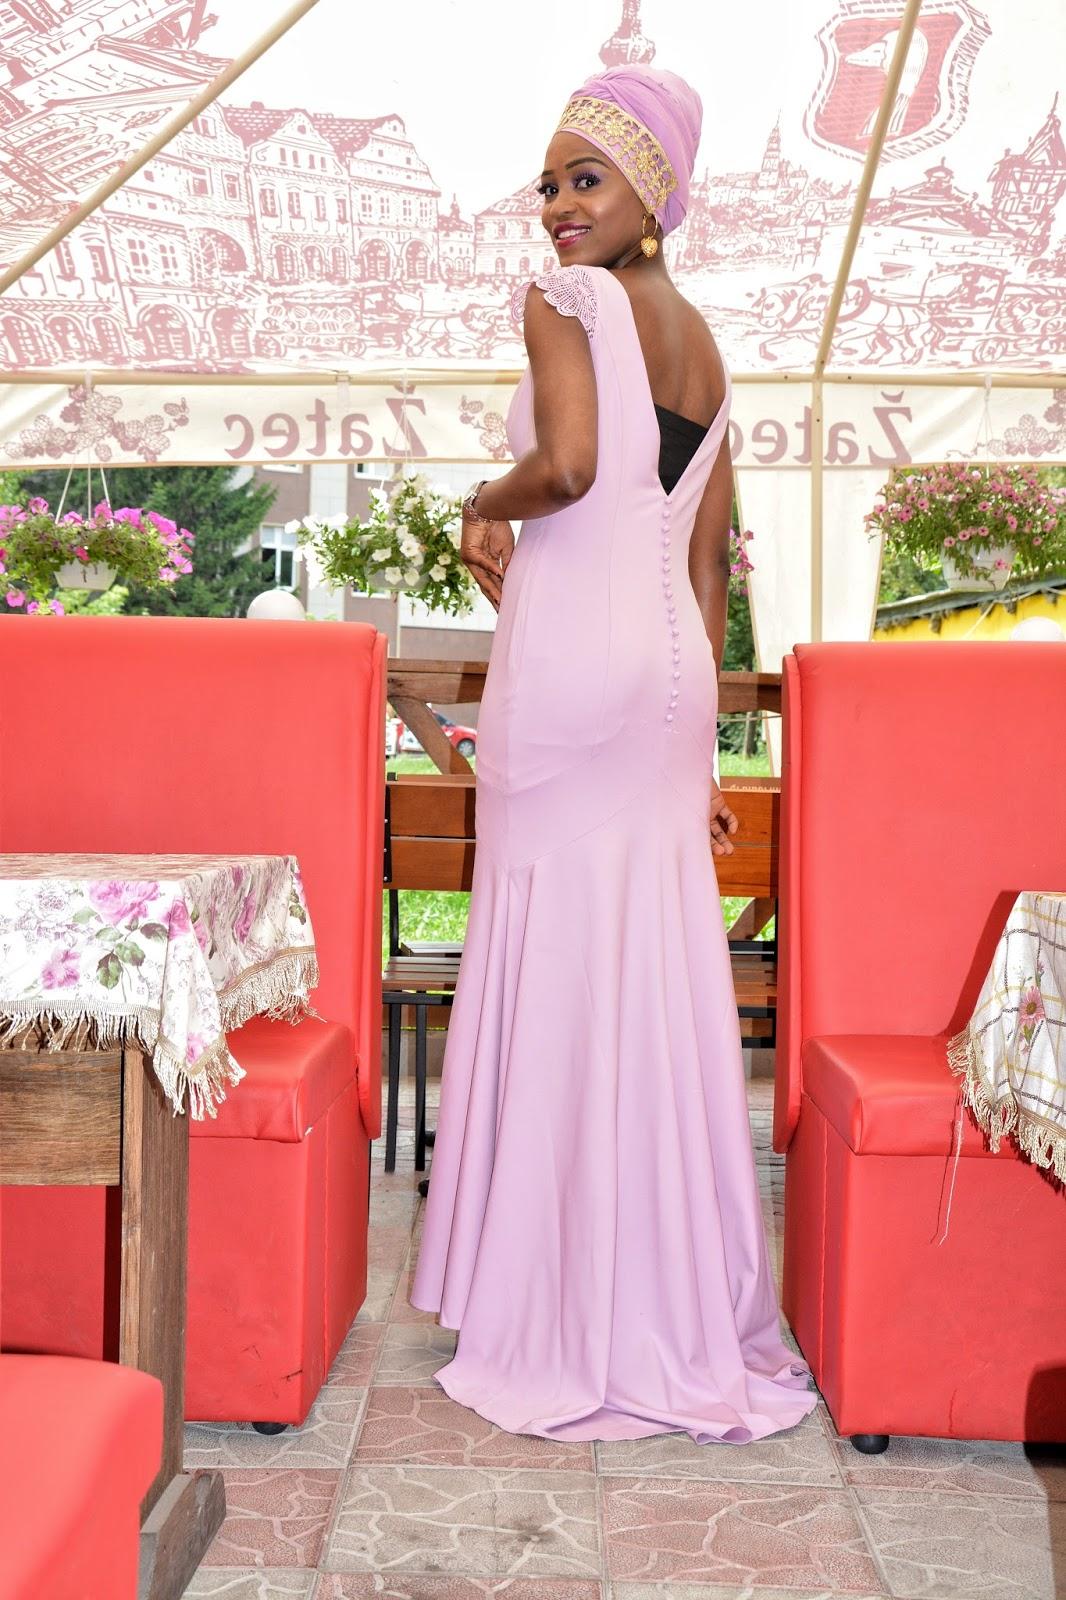 DIMPLEKHADI: DISCUSSION TIME : WEDDING DRESS OR BRIDESMAID DRESS ?